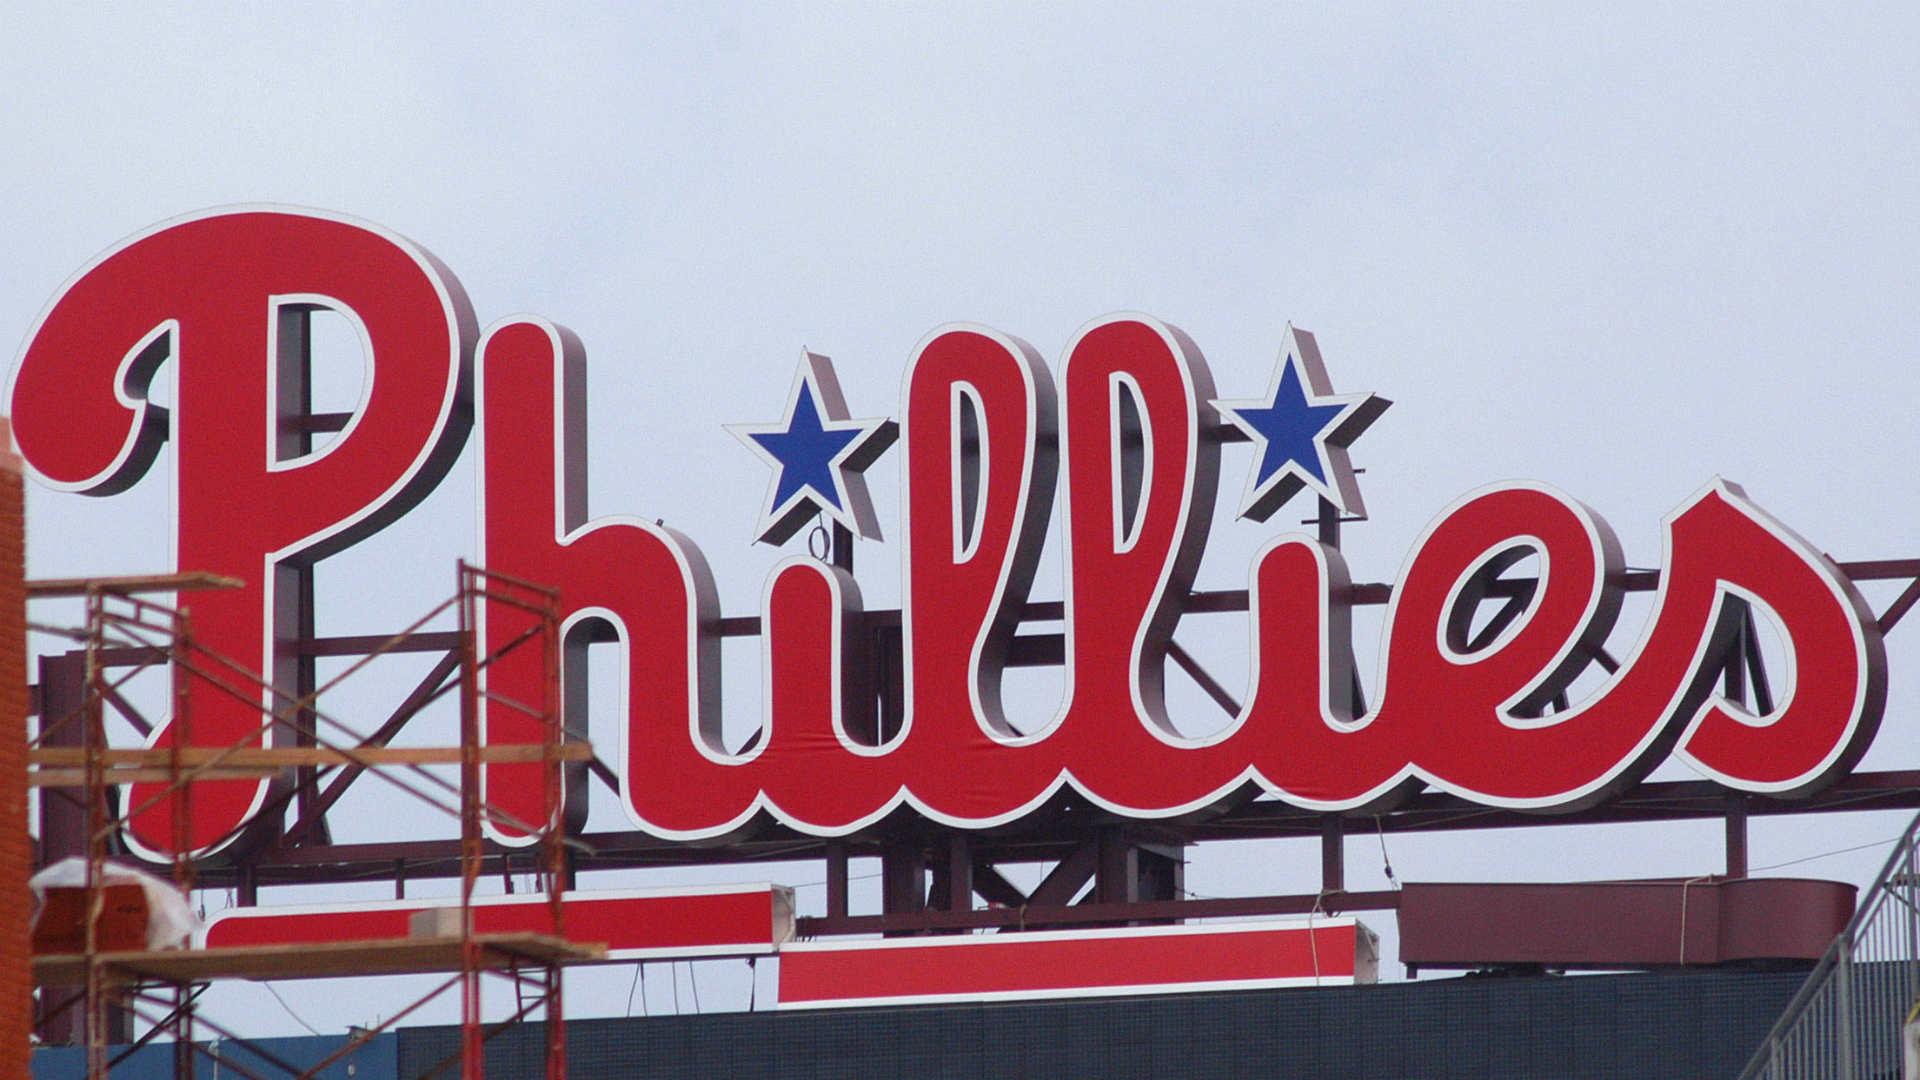 Phillies-logo-060916-usnews-getty-ftr_giuvespujukp1vfu6c2o6w7x3